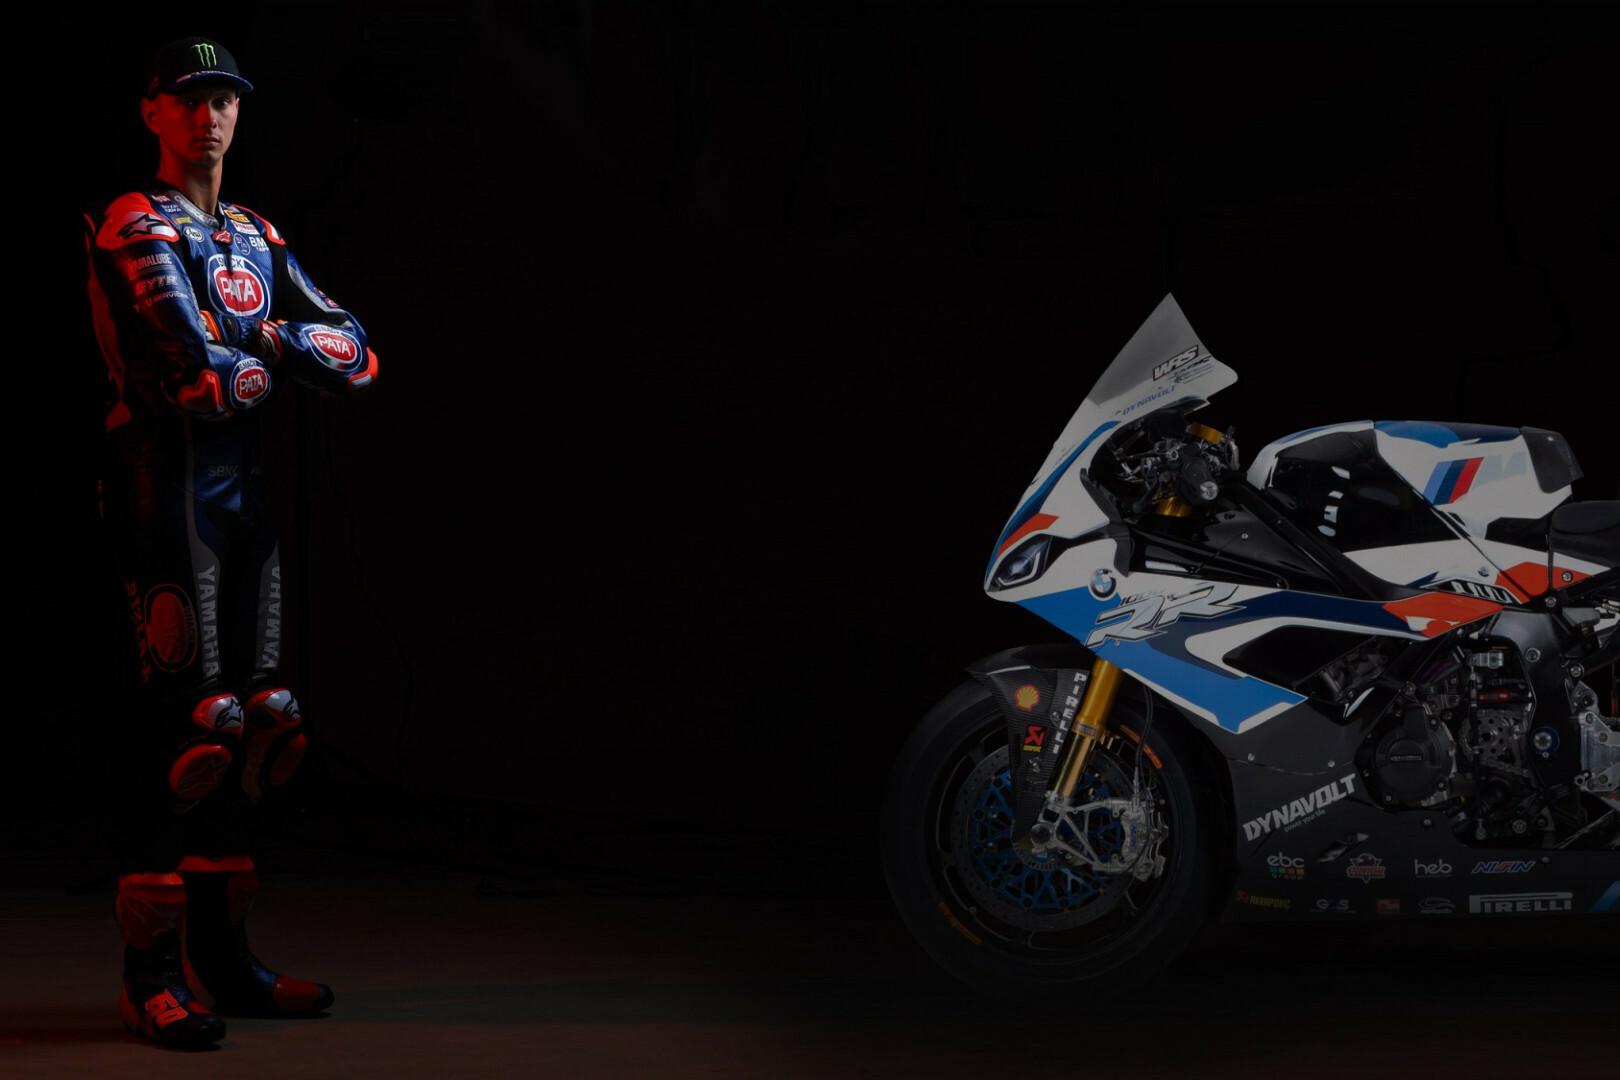 Michael Van der Mark firma con BMW para 2021